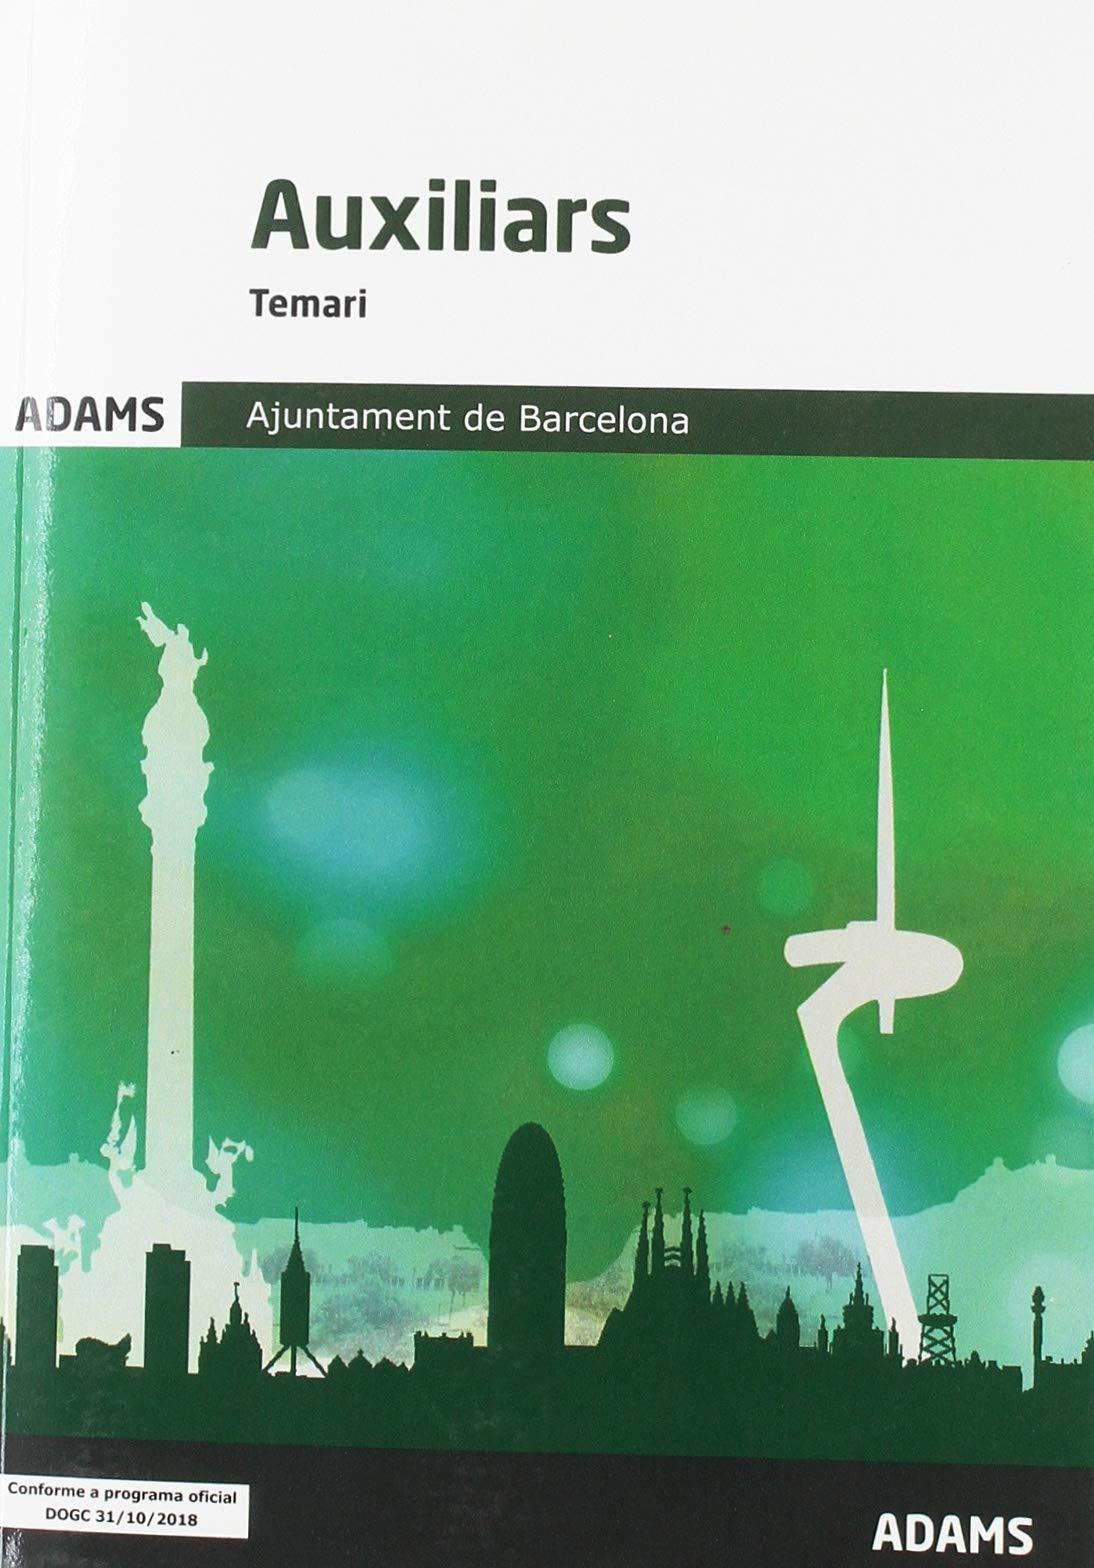 Temari Auxiliars Ajuntament de Barcelona